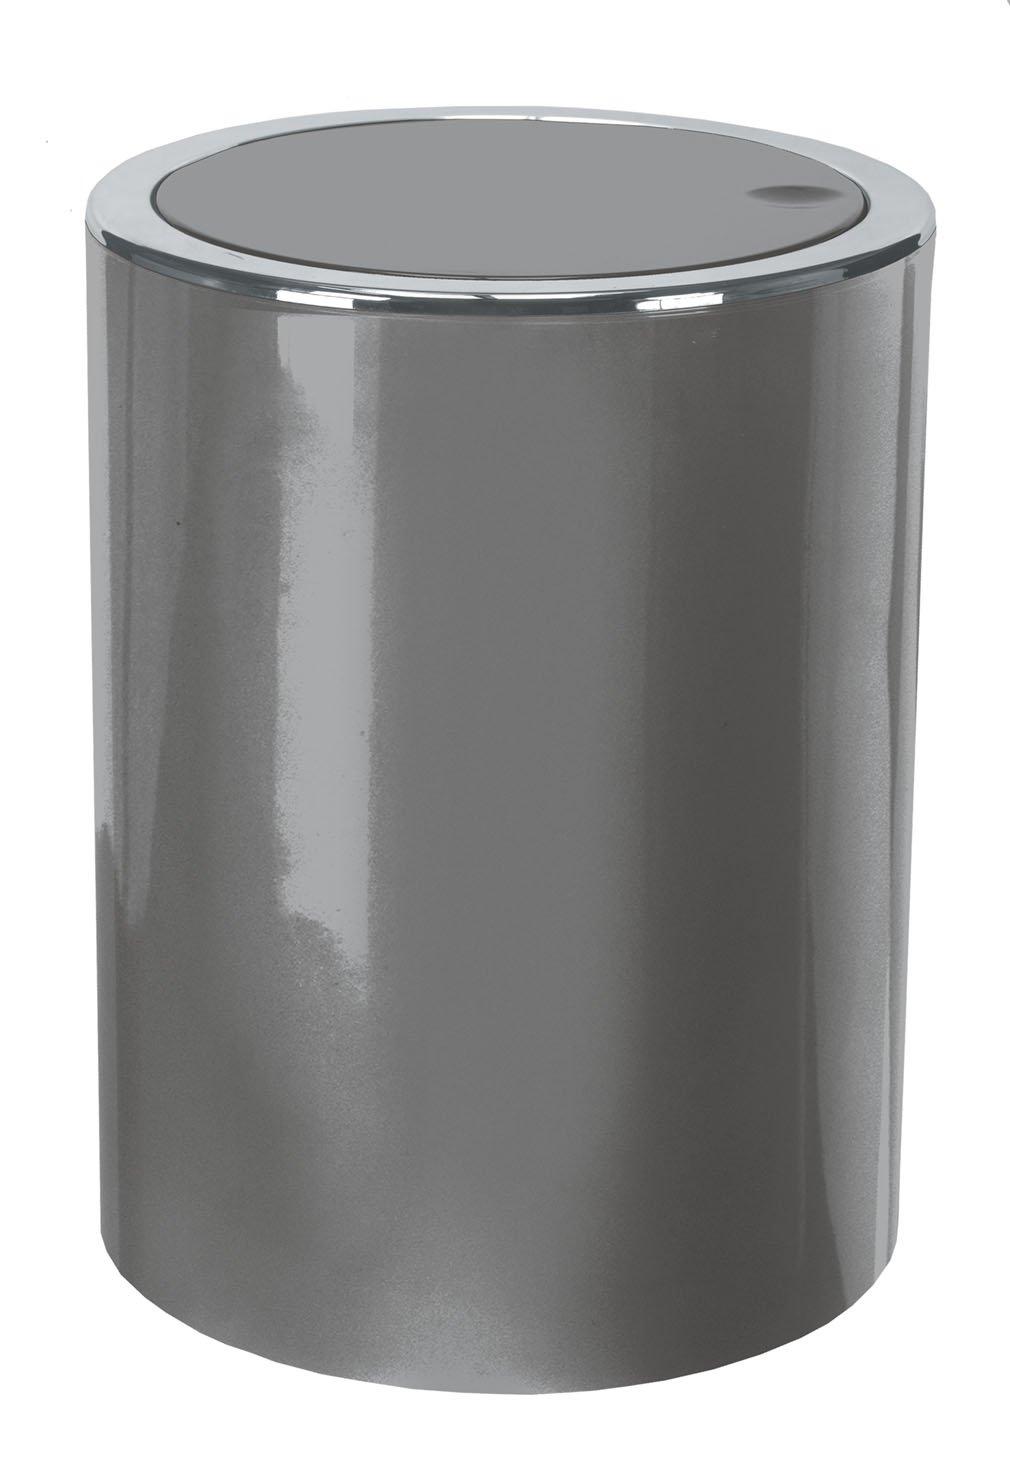 jvl modern tapered laundry basket with inset handles  grey  - kw clappe ltr plastic swing bathroom bin  kitchen